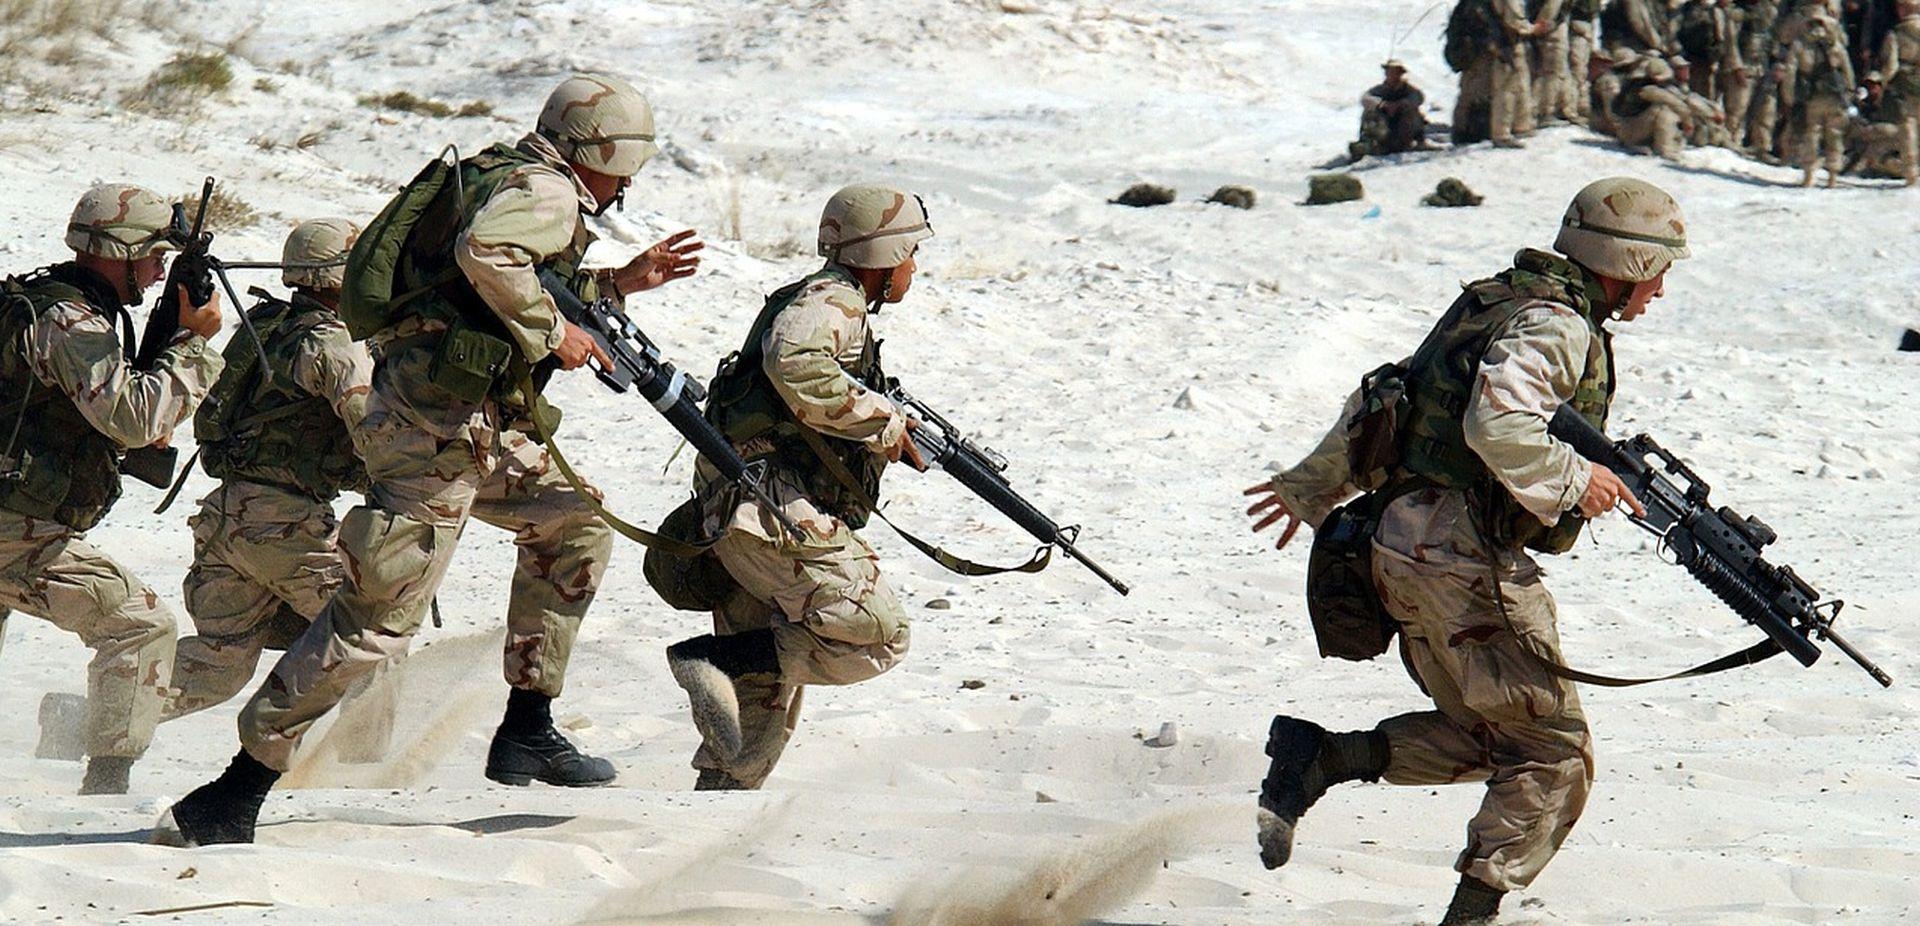 VOJNA SURADNJA Washington i Kijev započeli vojne vježbe u Ukrajini